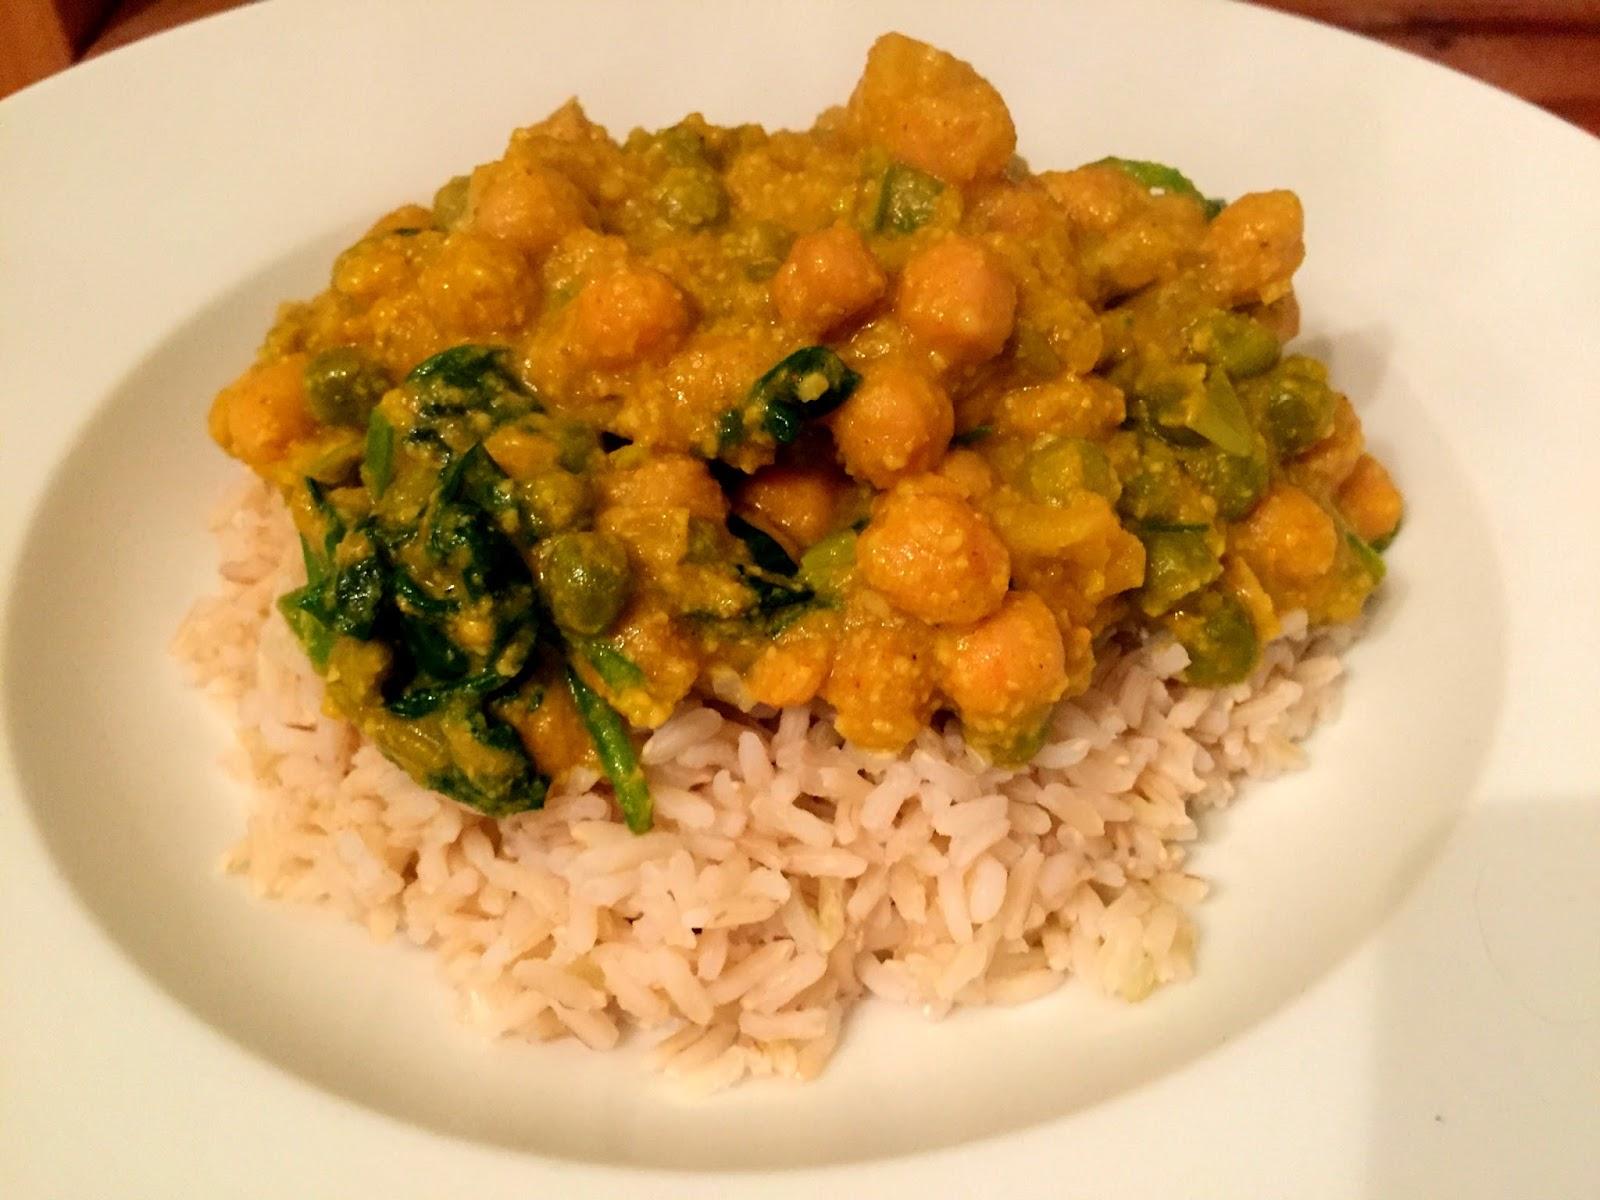 Naturally Sassy Sweet Potato & Chickpea Vegan Curry